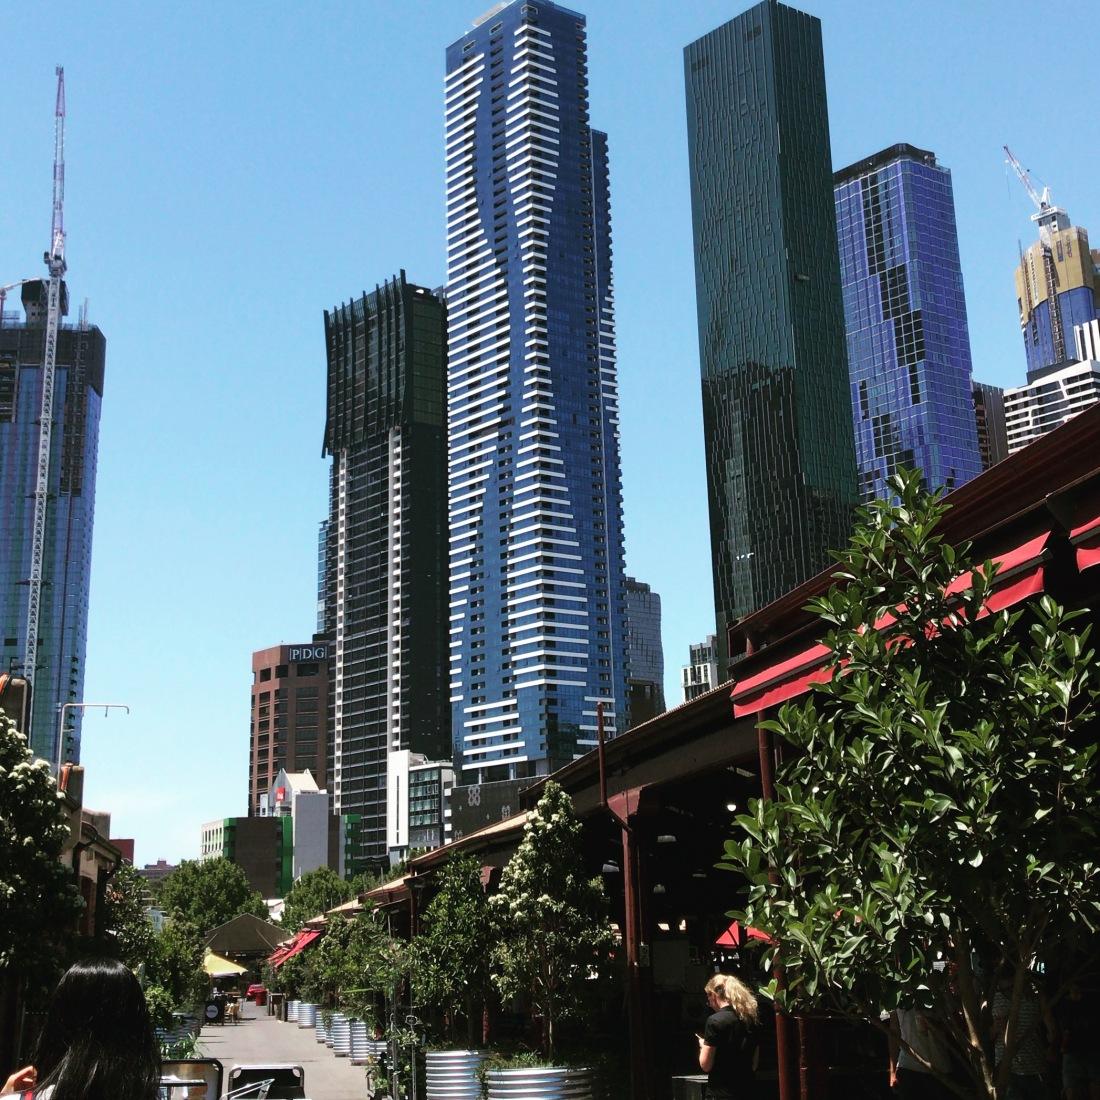 Australia Working Holiday: Expectations Vs Reality